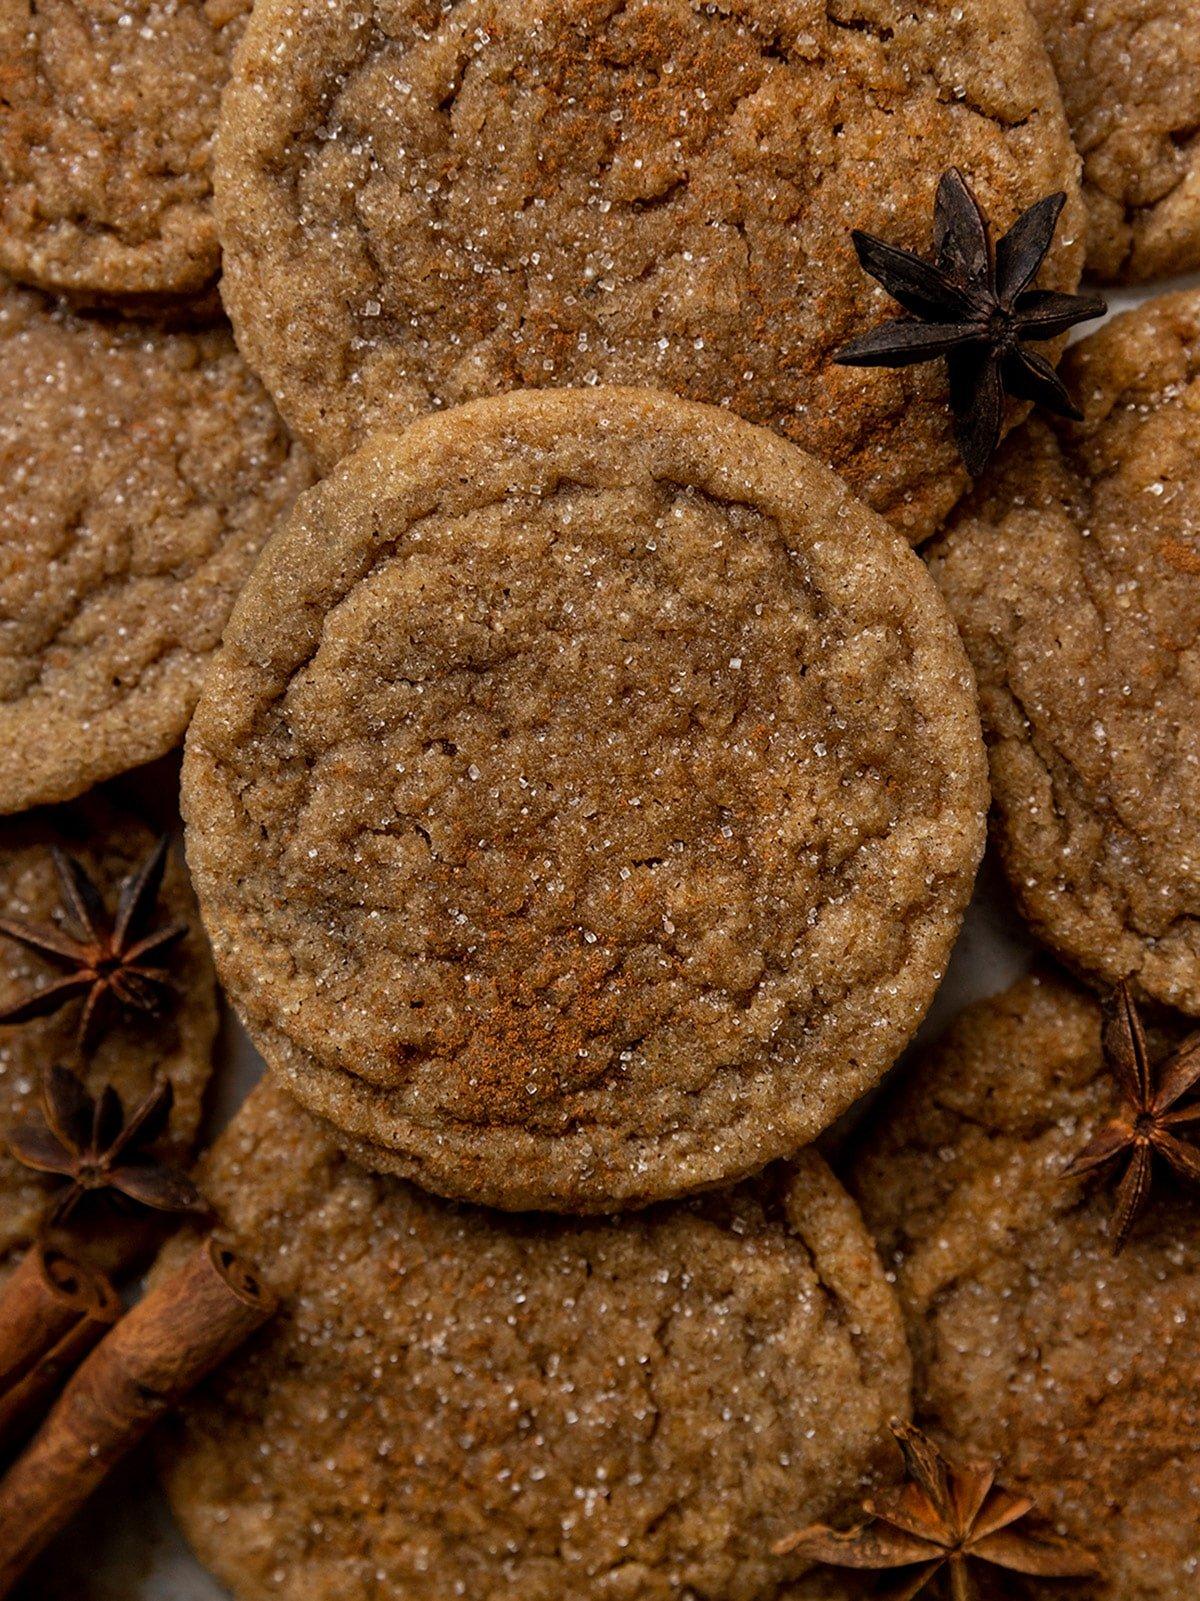 close up shot of brown sugar cookies with cinnamon sugar on top